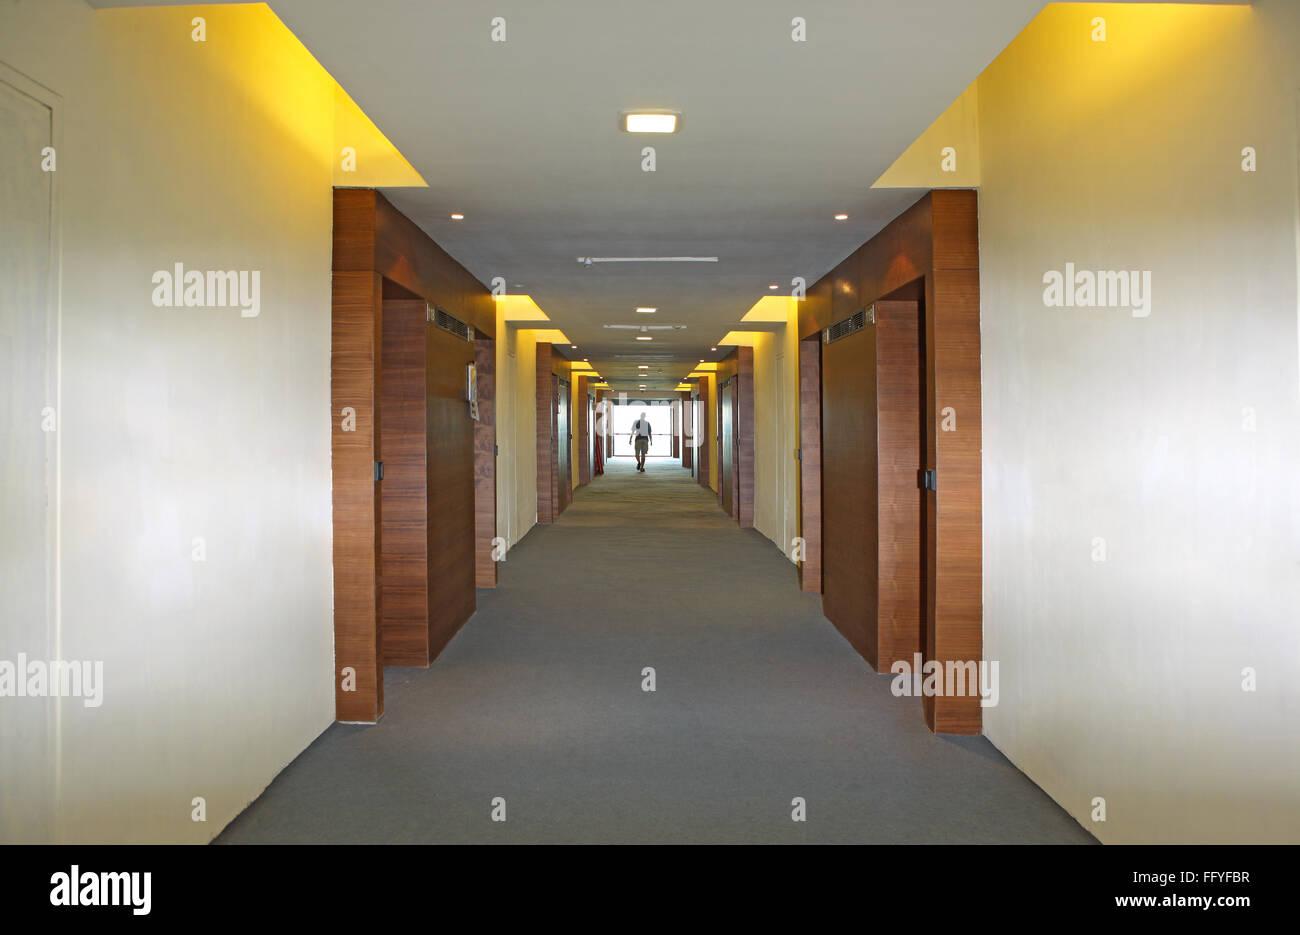 Man walking in corridor - Stock Image